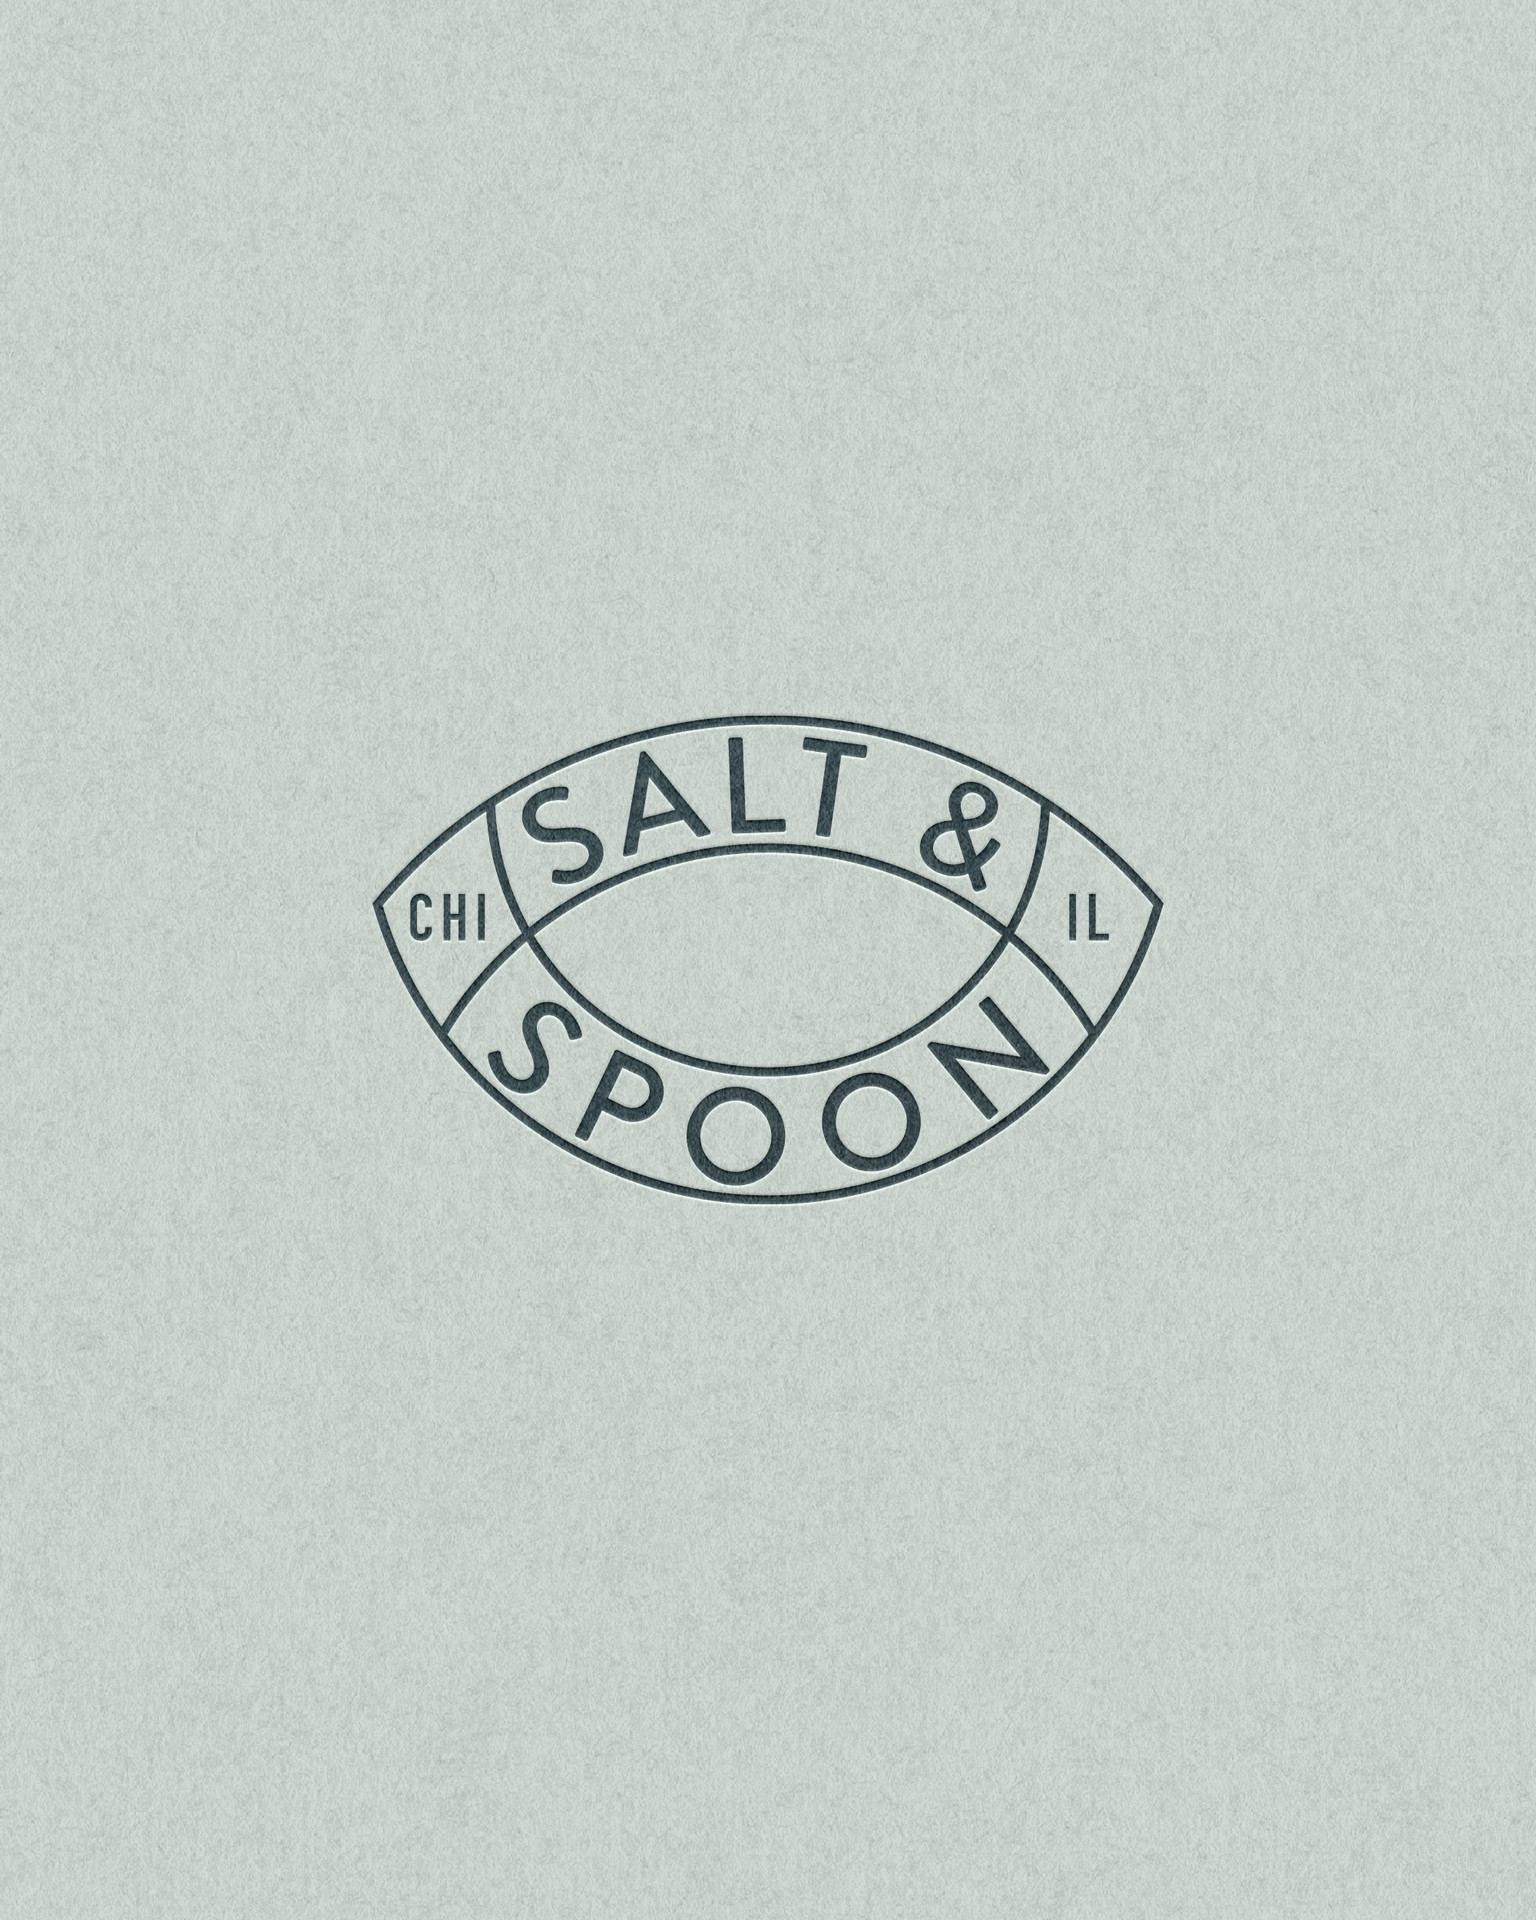 Salt-Spoon.jpg